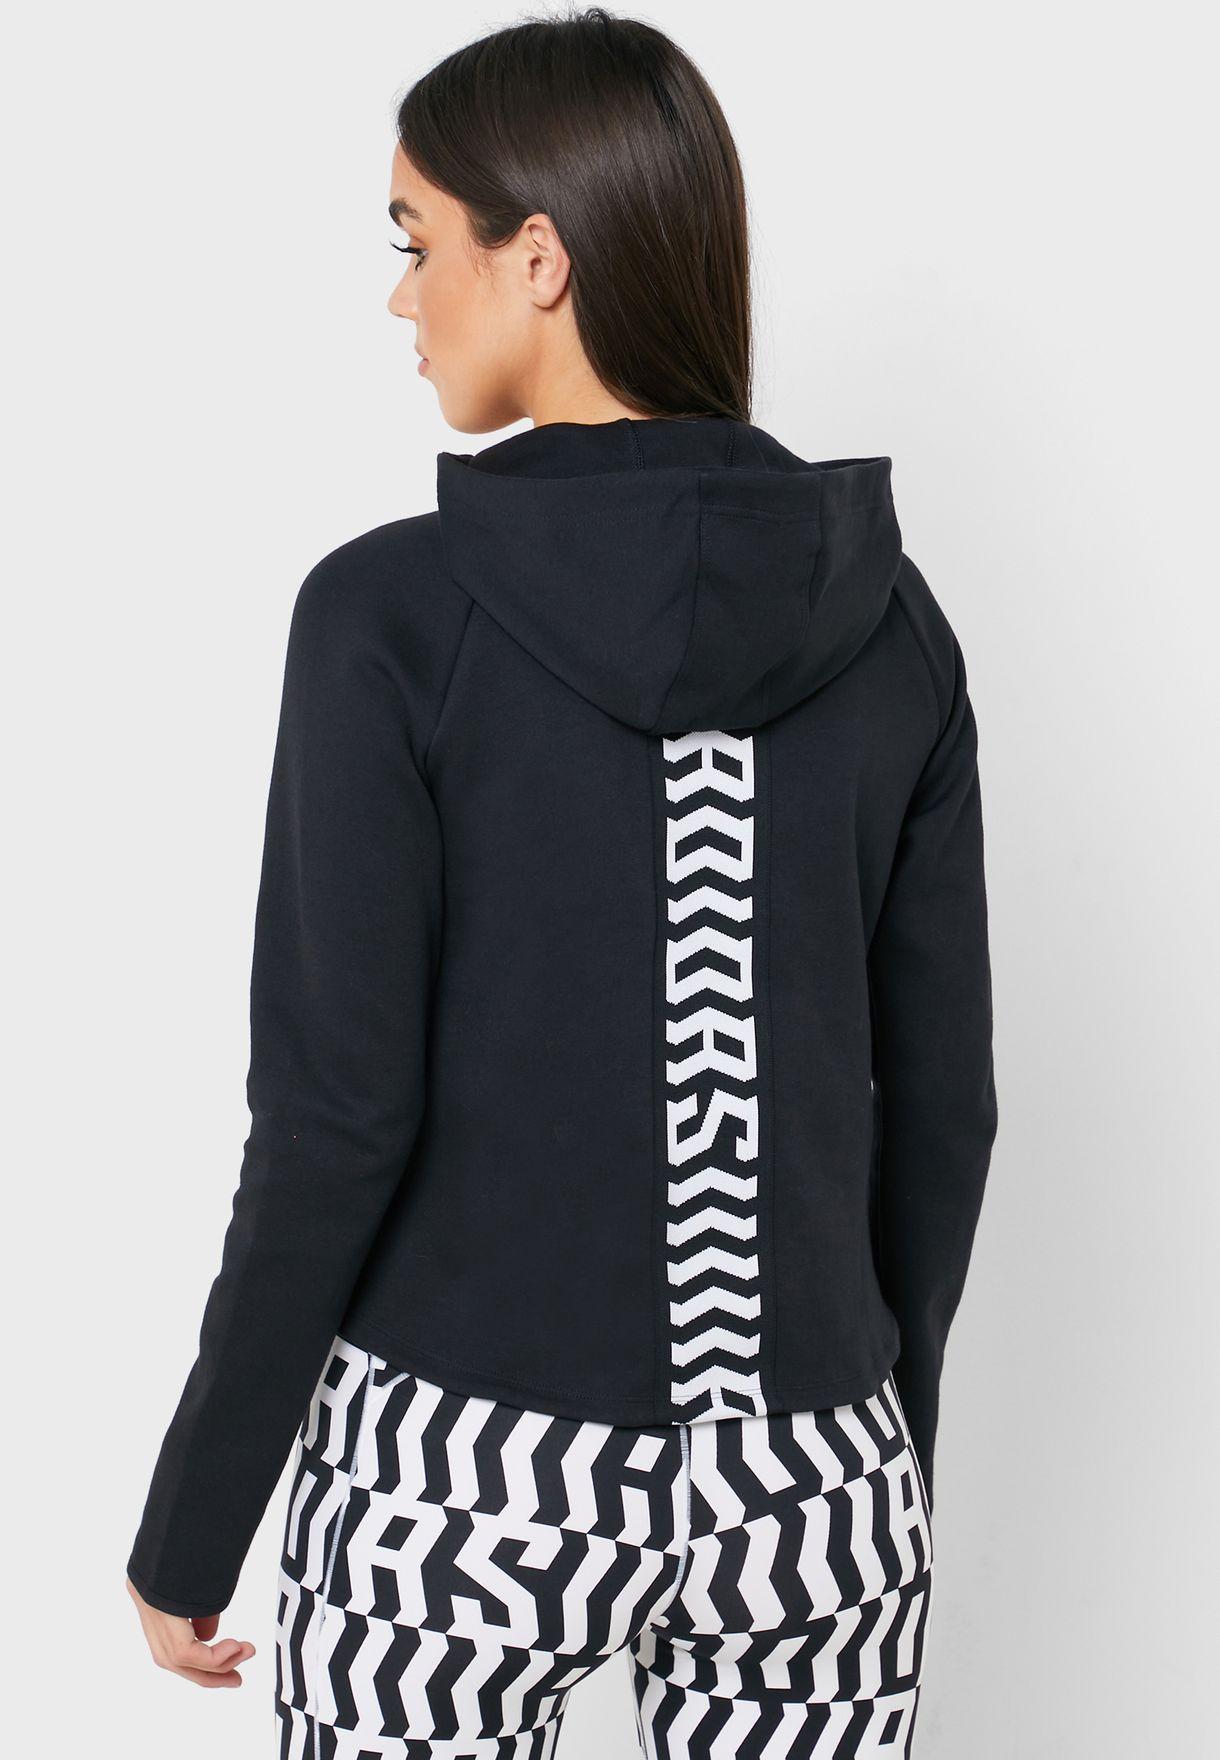 TKO Hooded Jacket